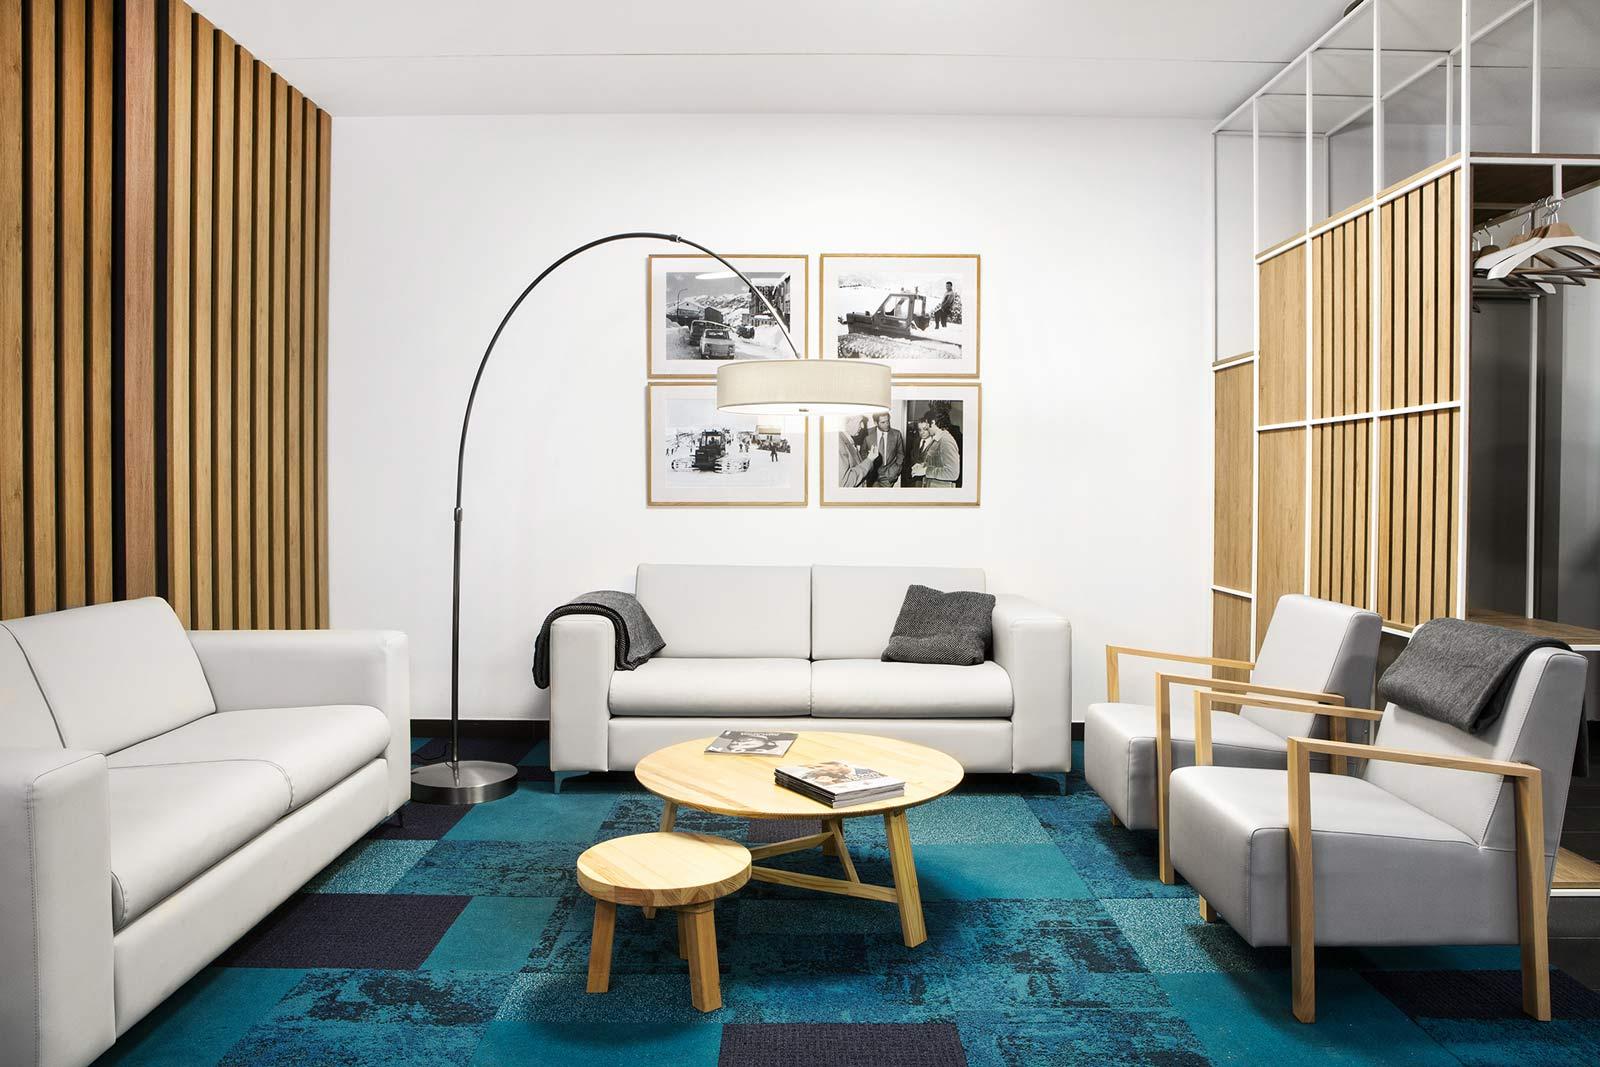 Frontal de Sala Vip Lounge Telecabina El Tarter, Grandvalira - Rosa Colet